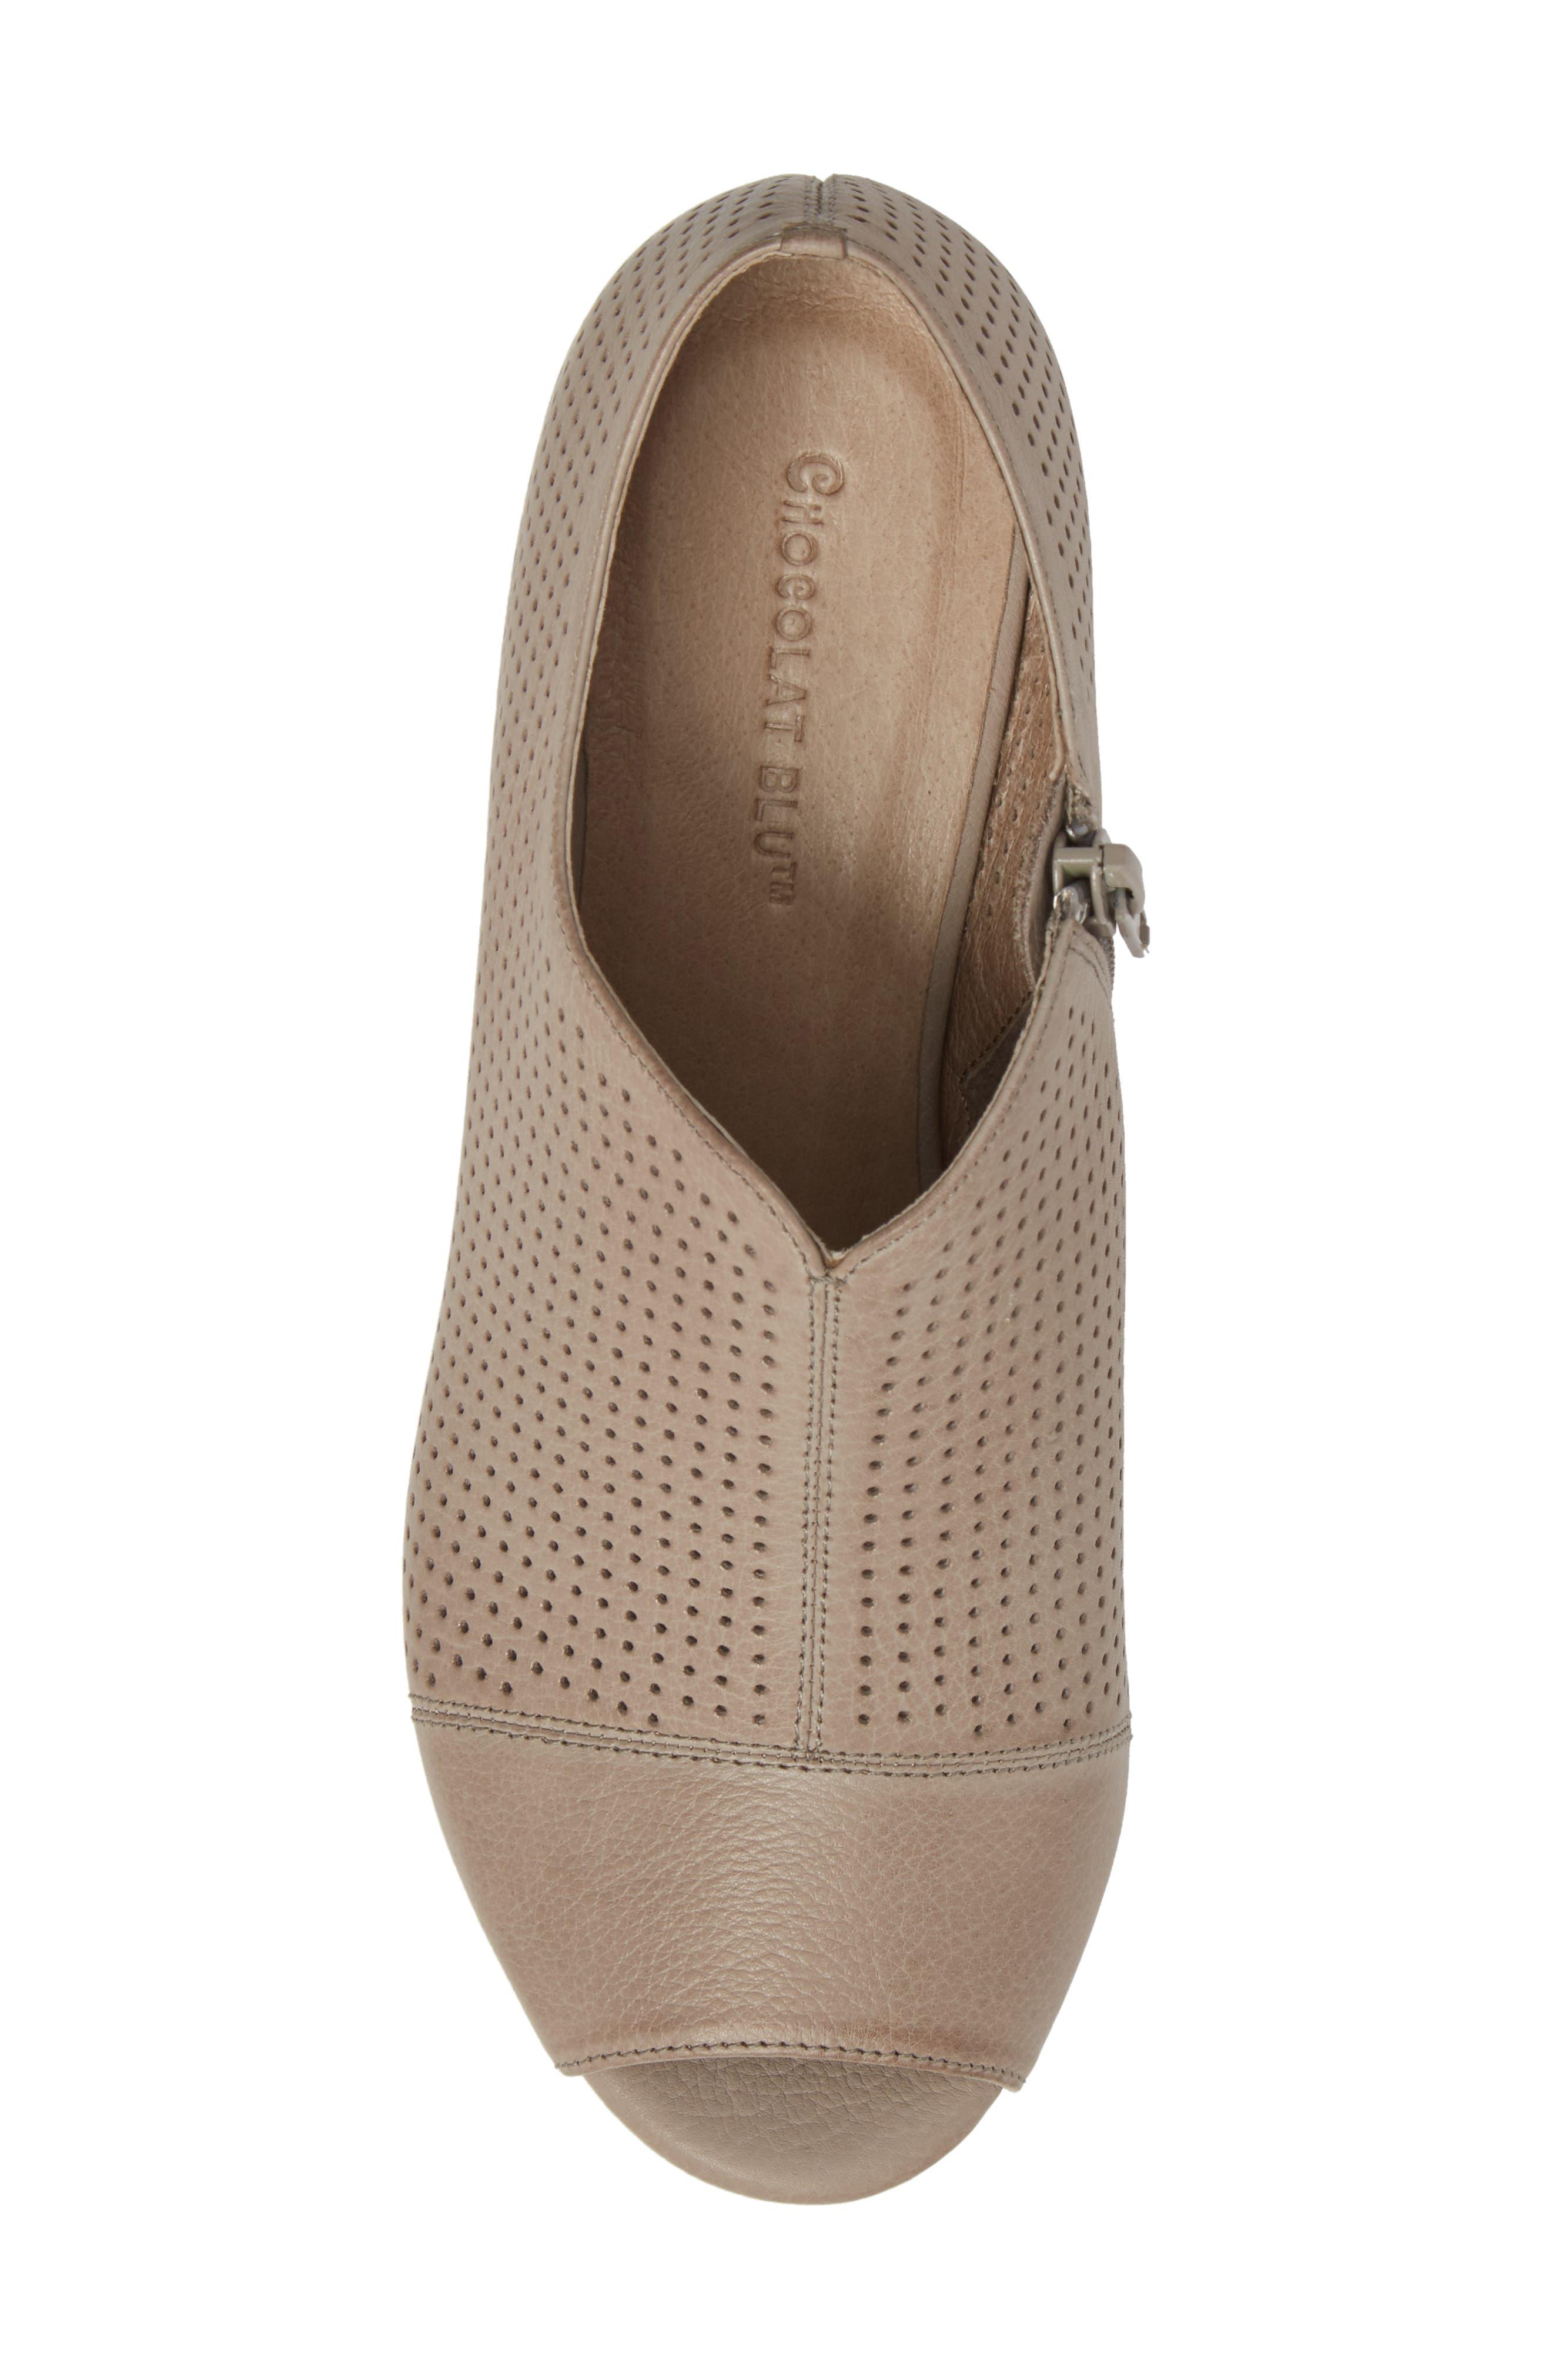 Wheeler Wedge Sandal,                             Alternate thumbnail 5, color,                             Grey Leather